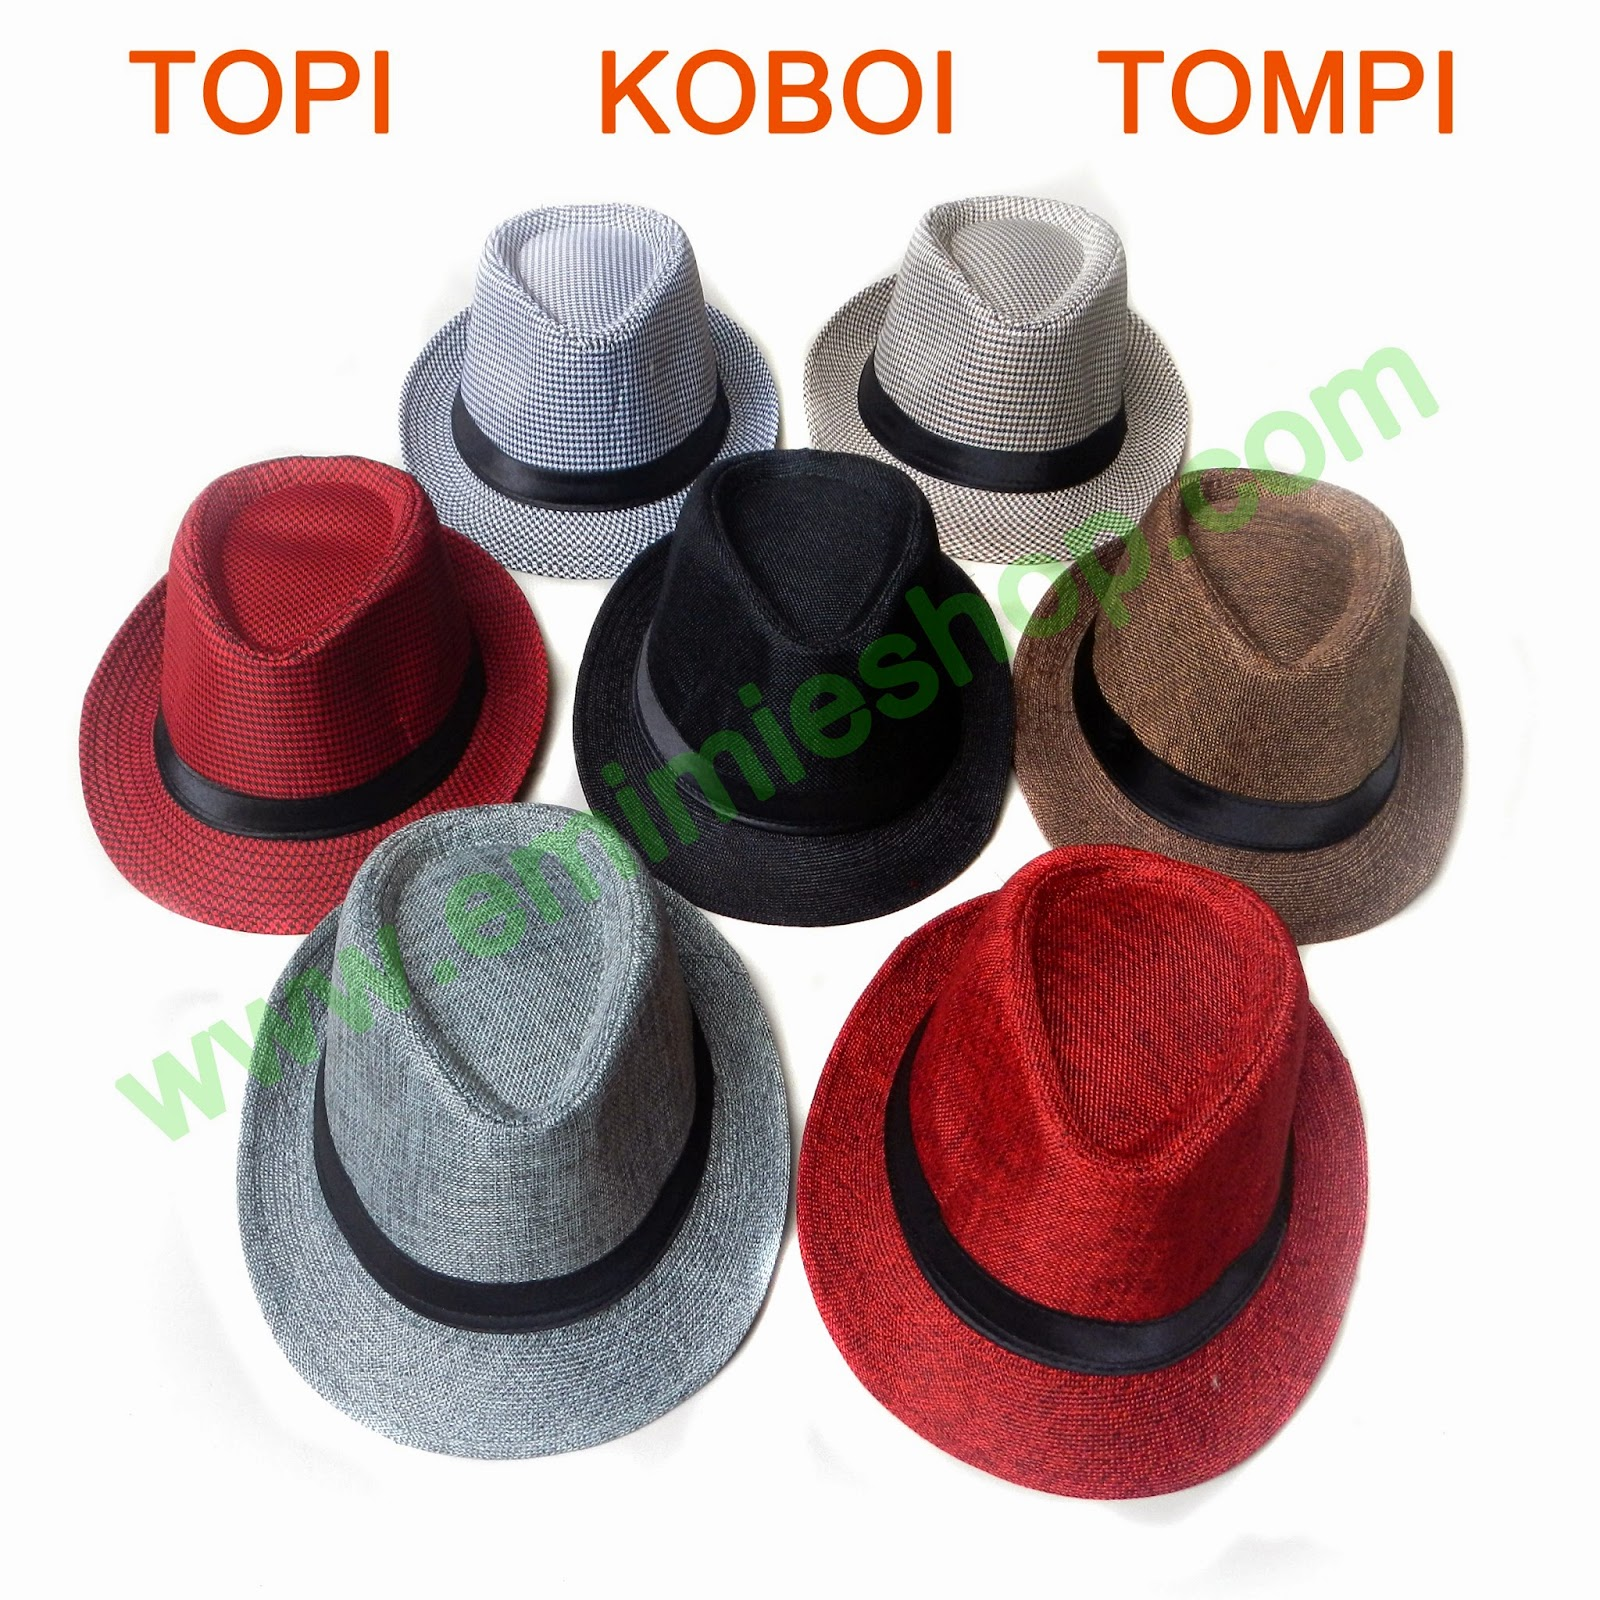 Topi Jazz Tompi